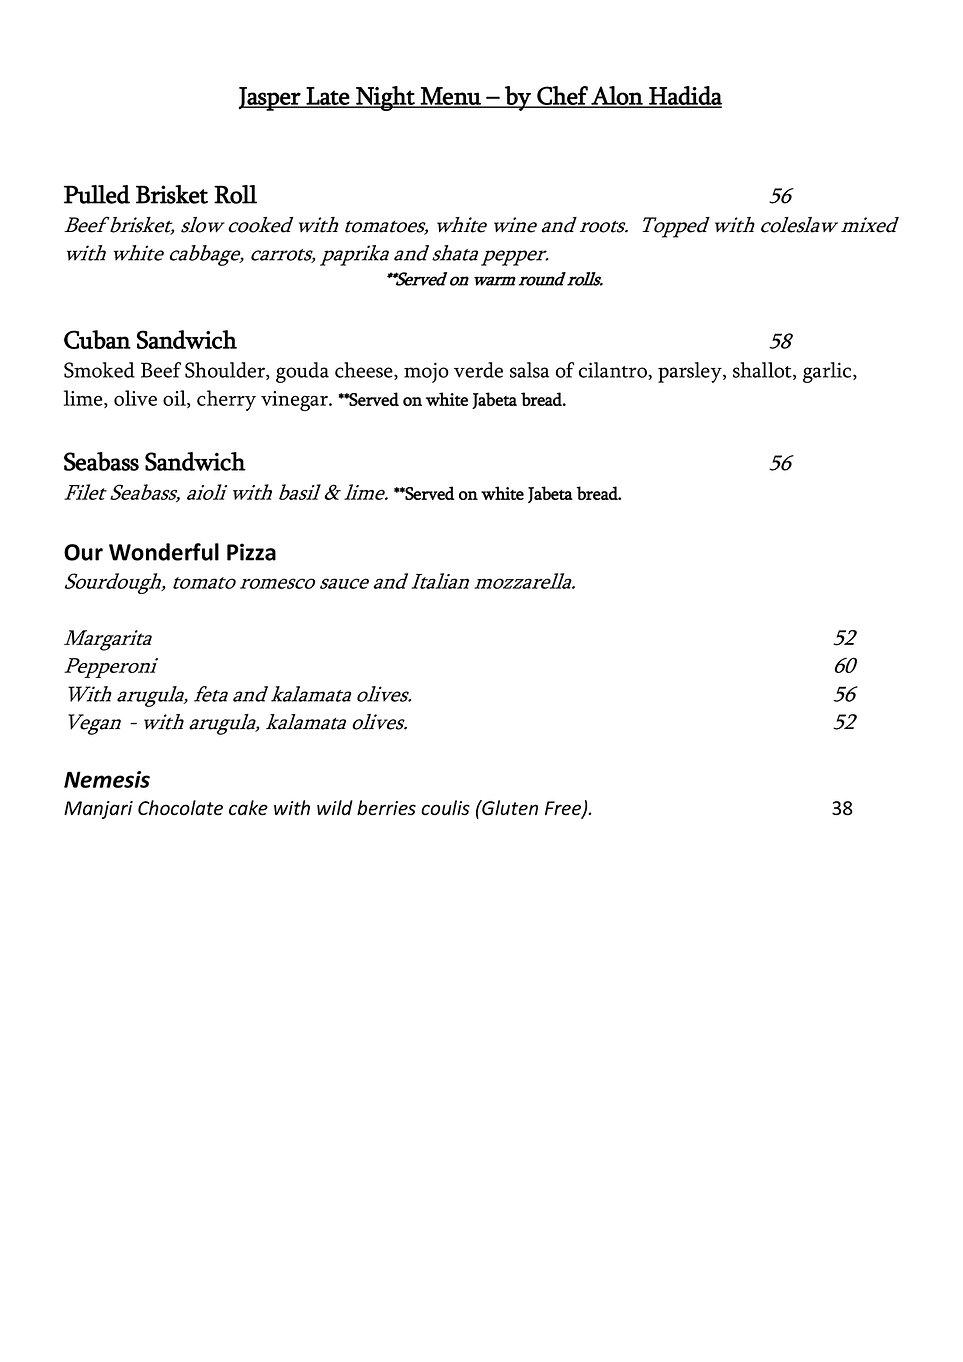 JasperJohns late night menu.jpg